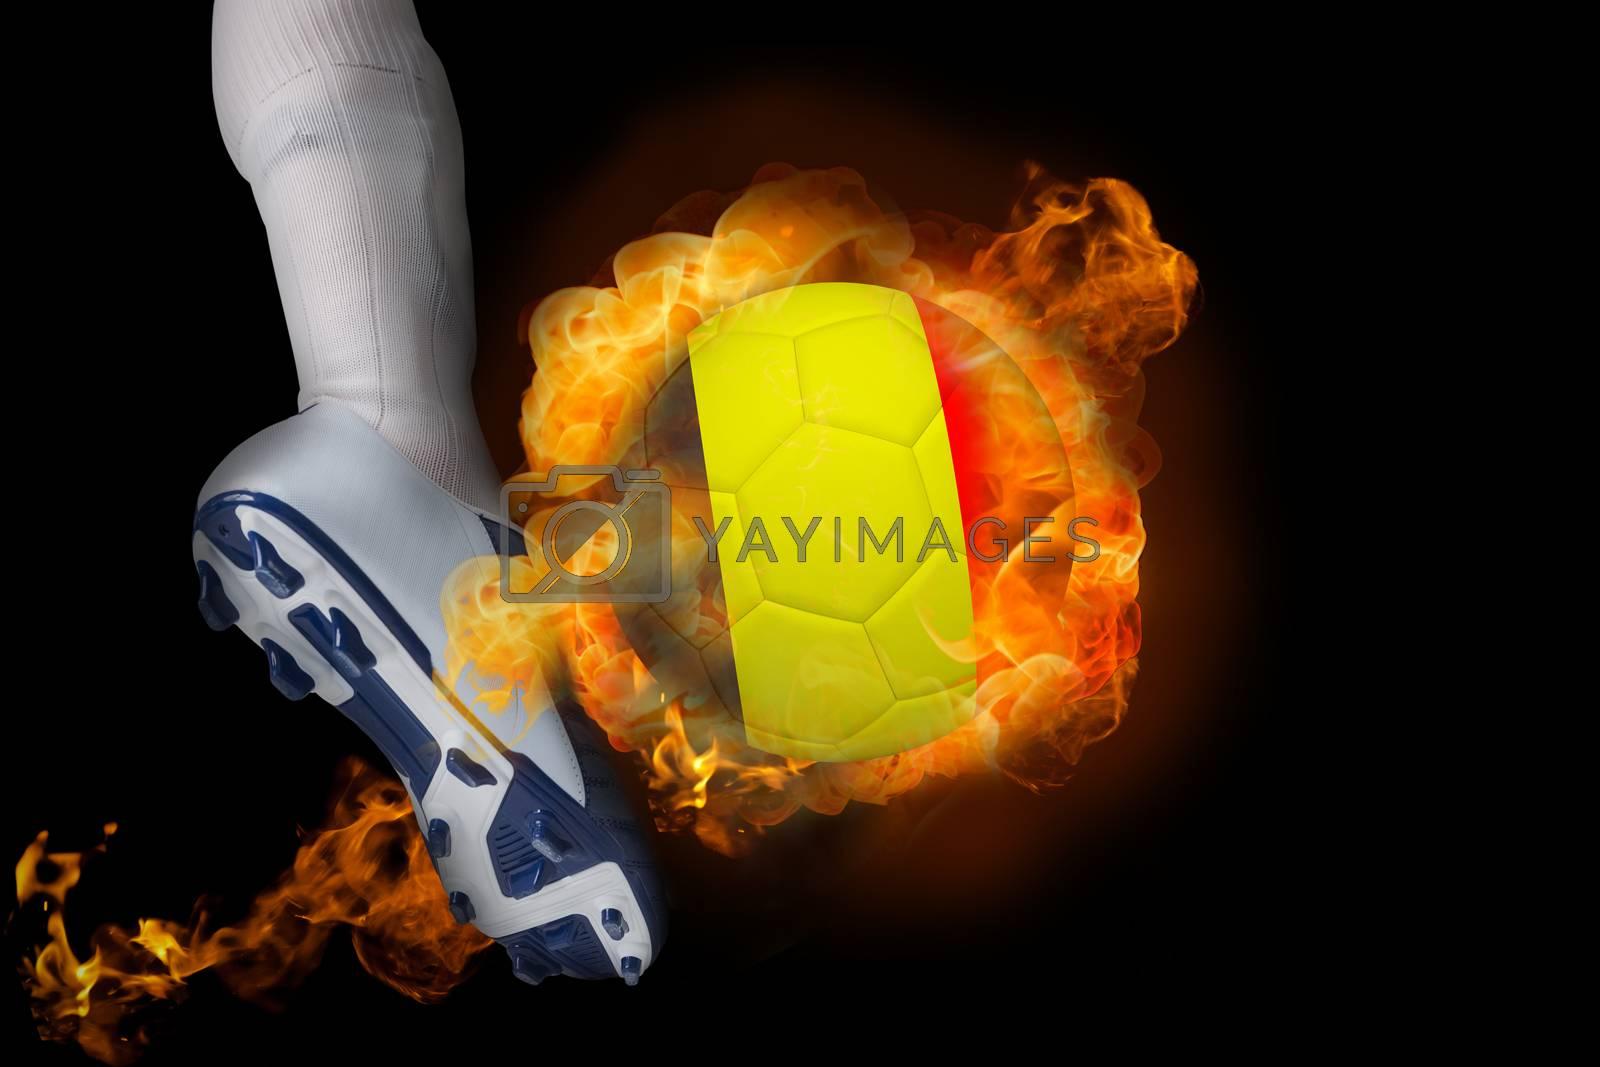 Football player kicking flaming belgium ball by Wavebreakmedia